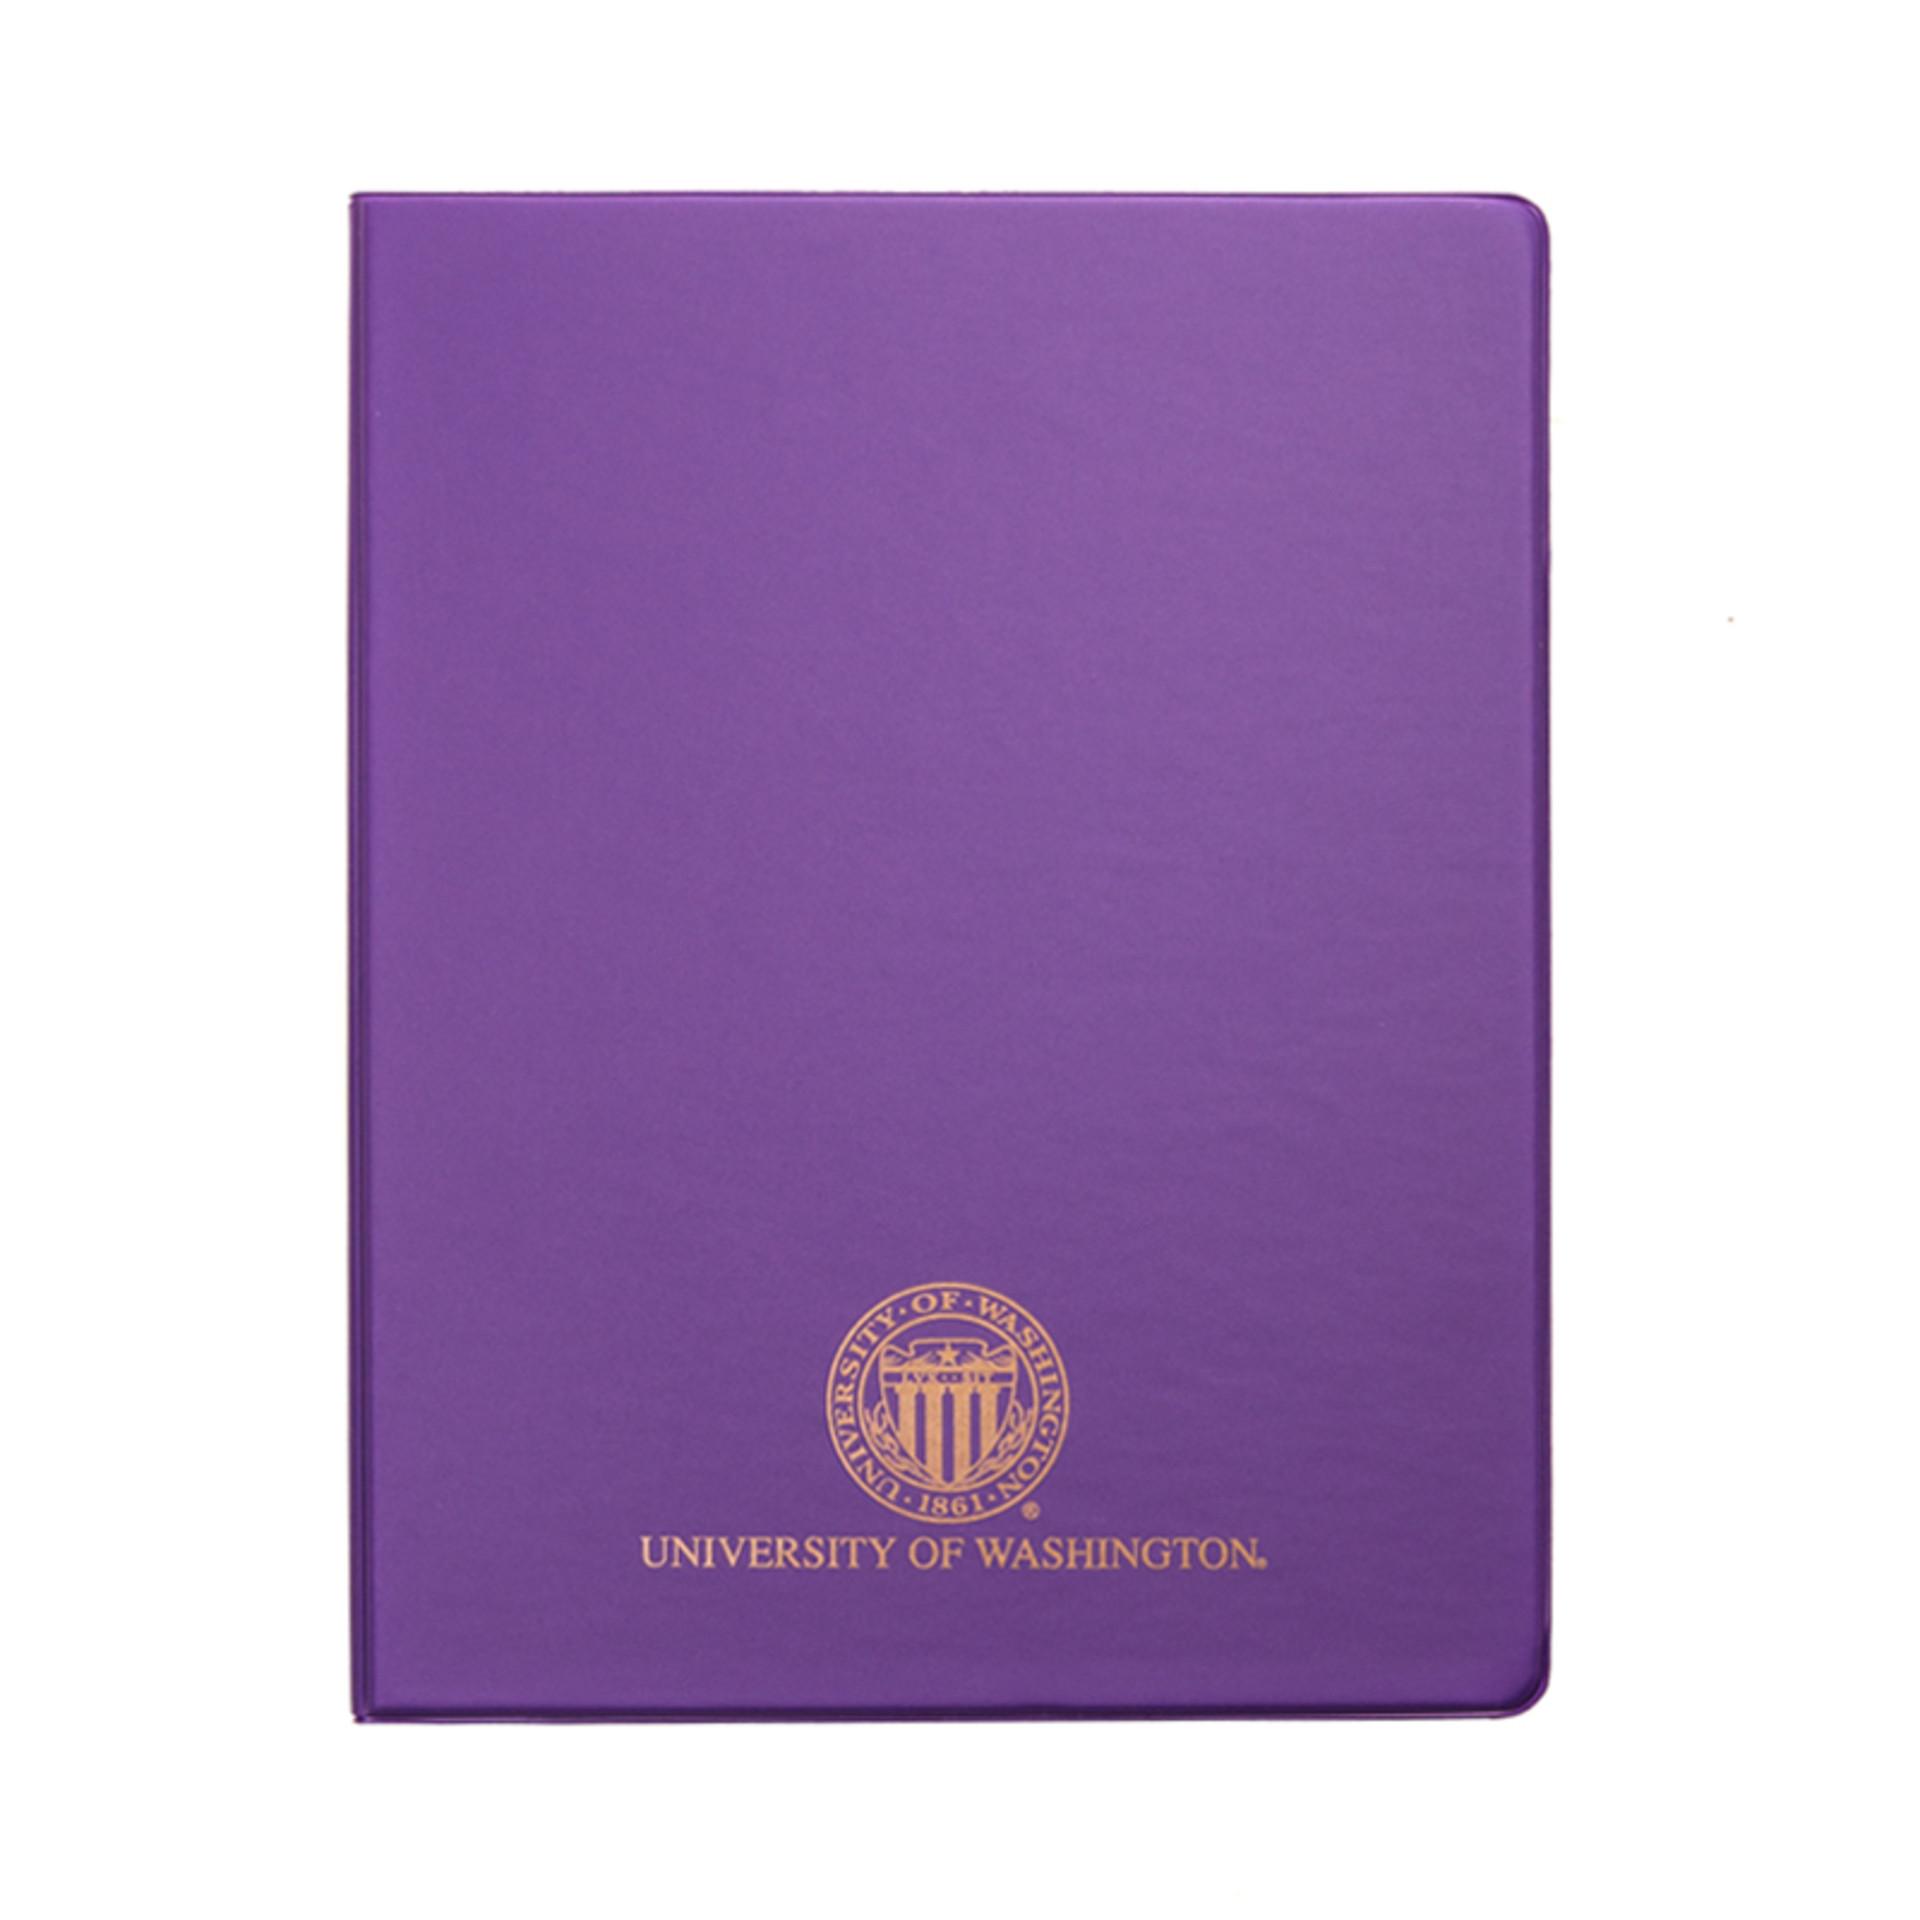 Four Point UW Seal Padholder Purple